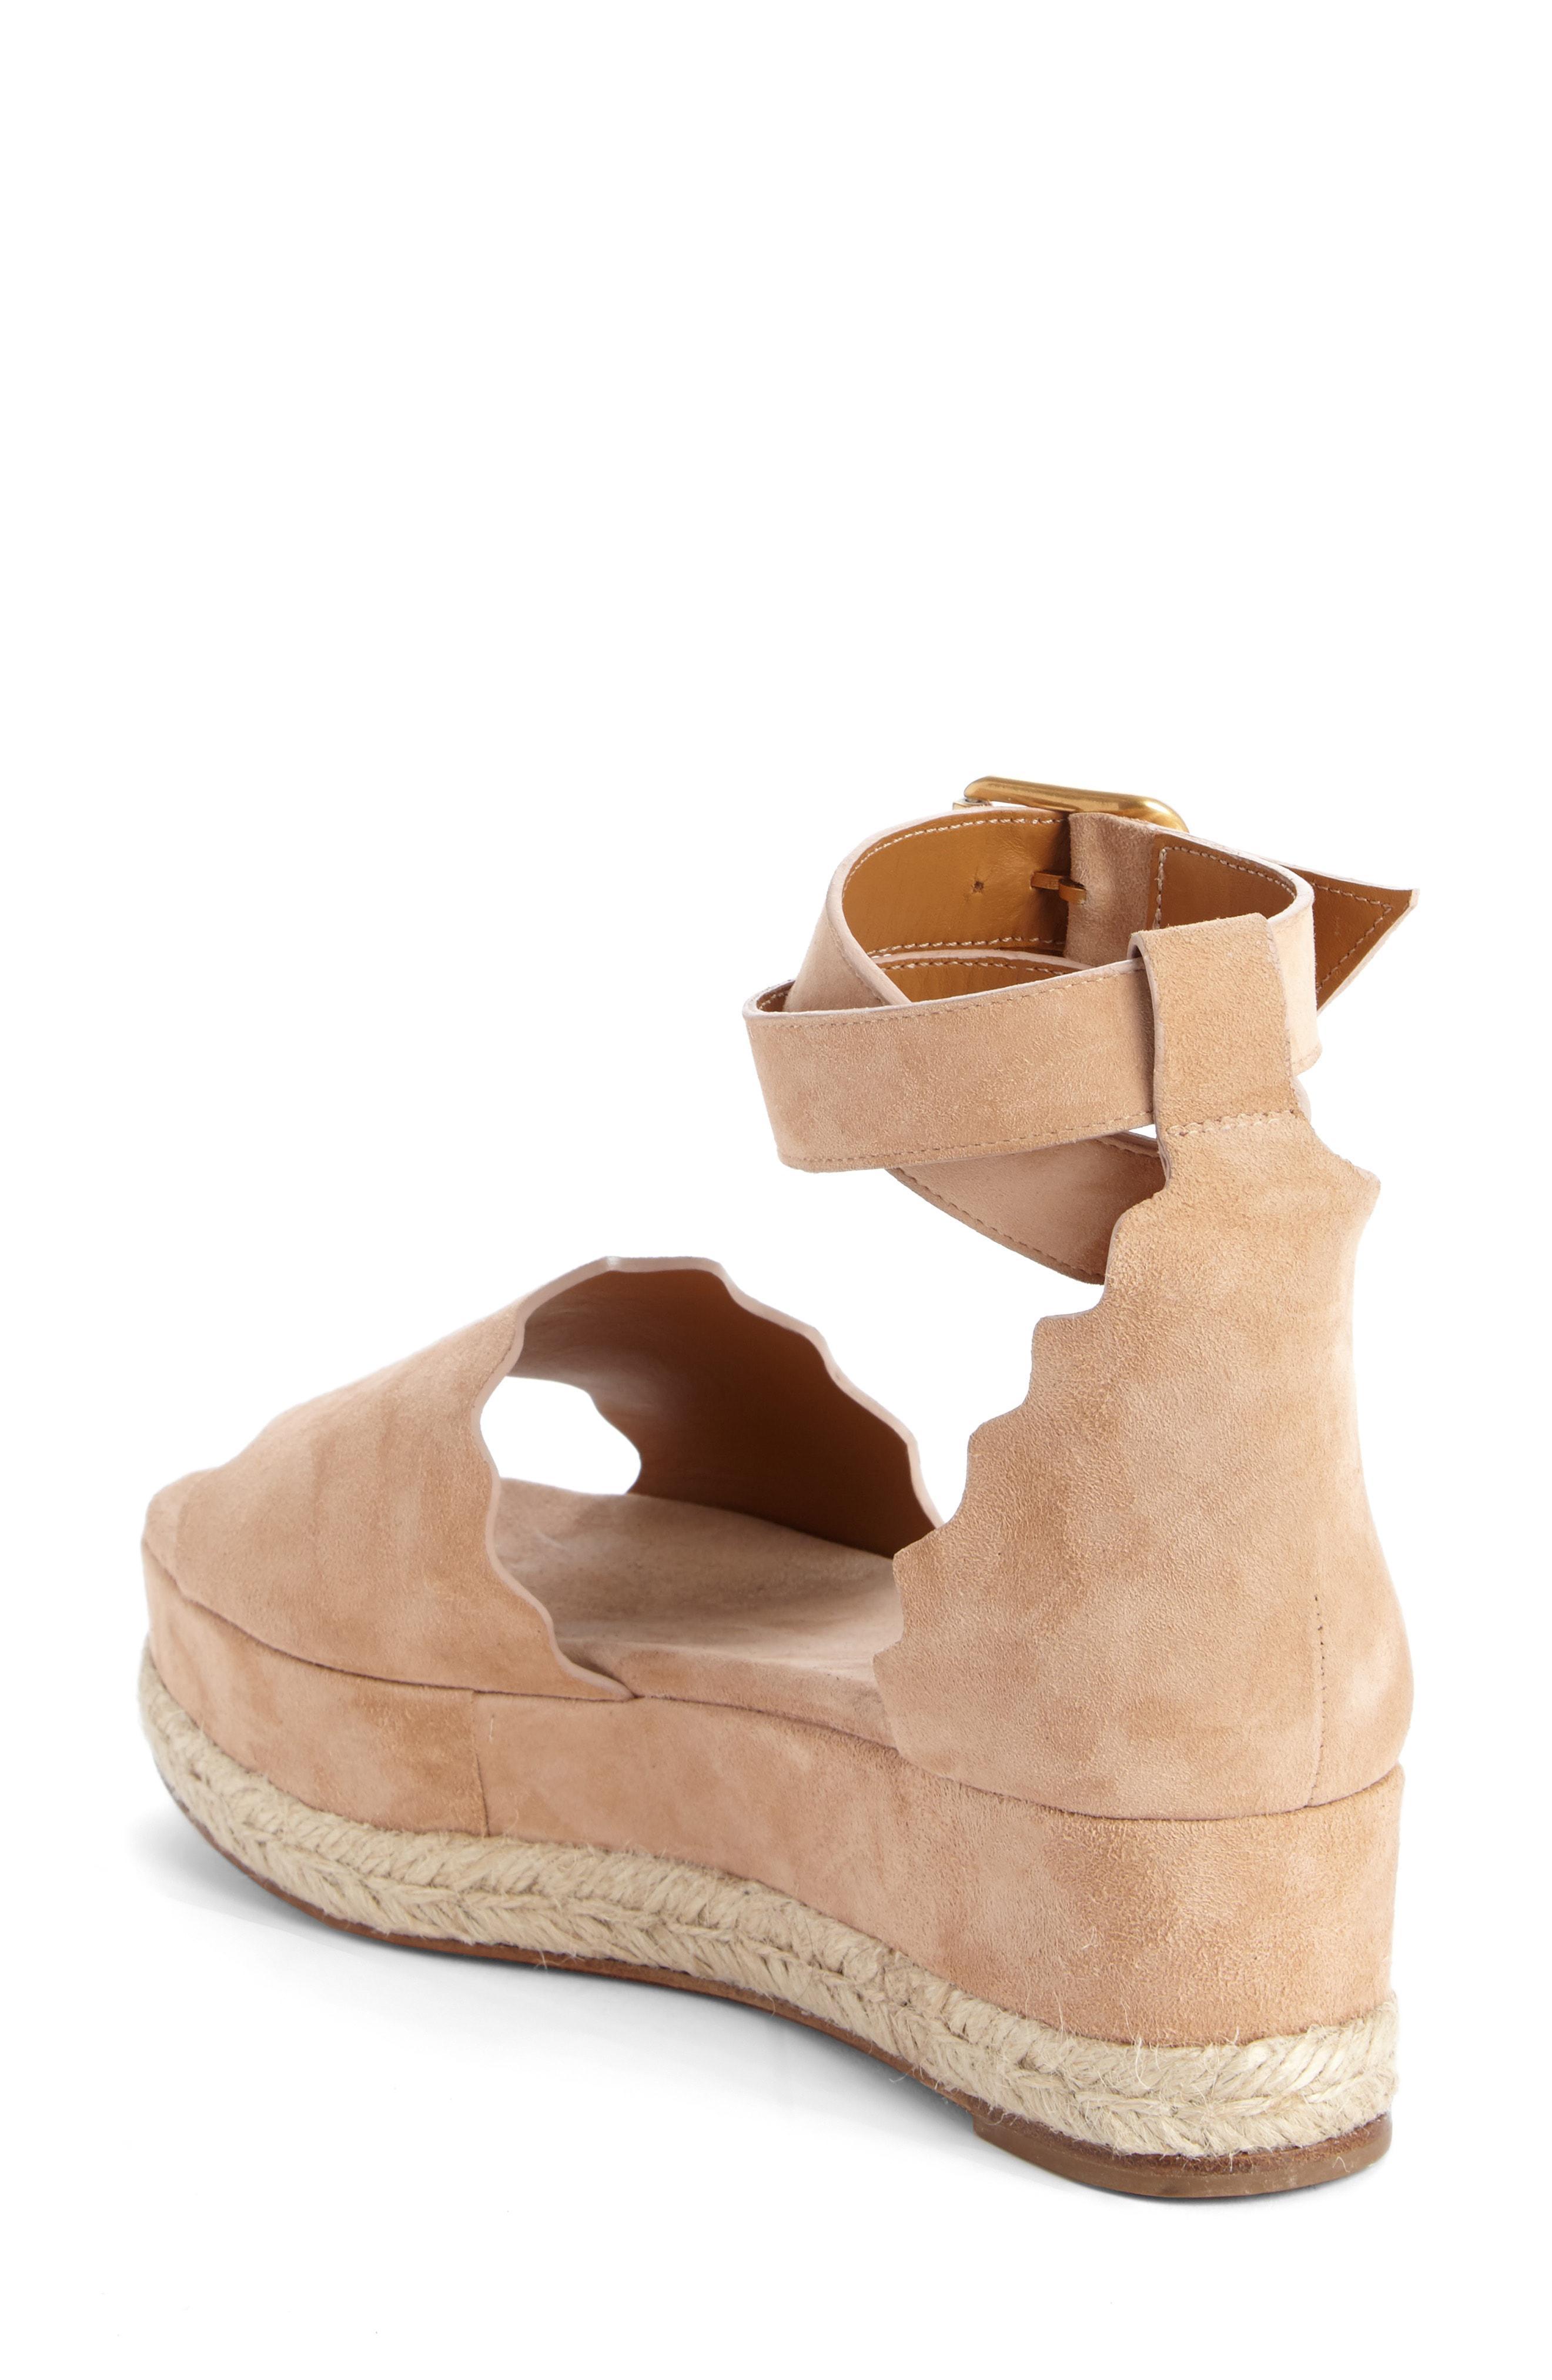 00282f8d98f3 Lyst - Chloé Lauren Espadrille Wedge Sandal in Brown